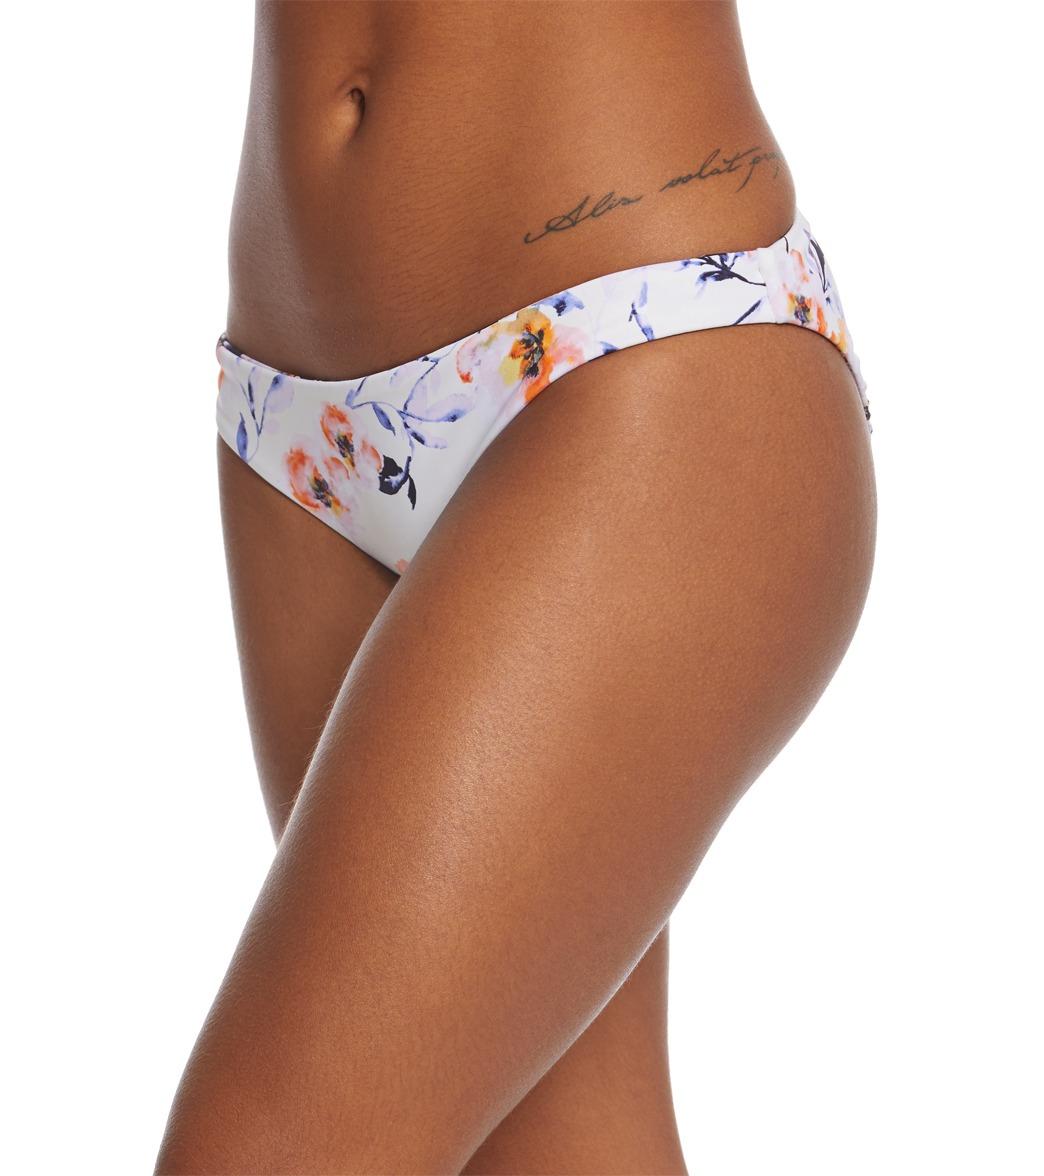 522c91d9bb Bikini Lab True Watercolors Reversible Hipster Bikini Bottom at ...